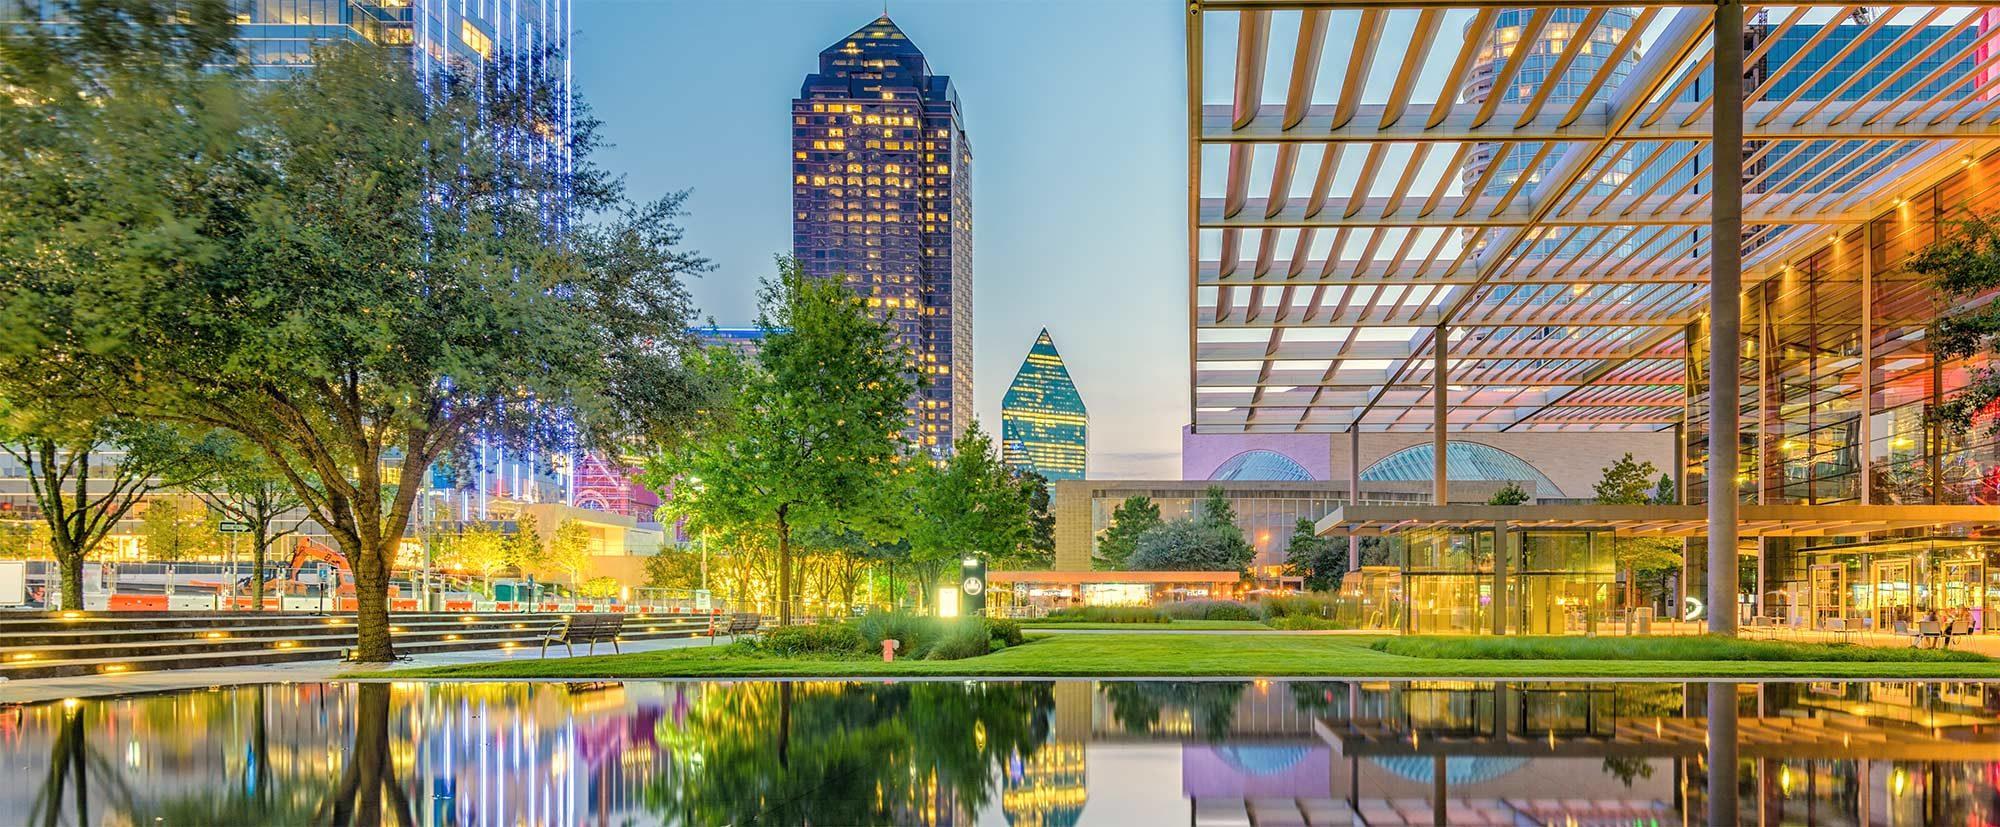 Dallas Arts District - Stillwater Capital